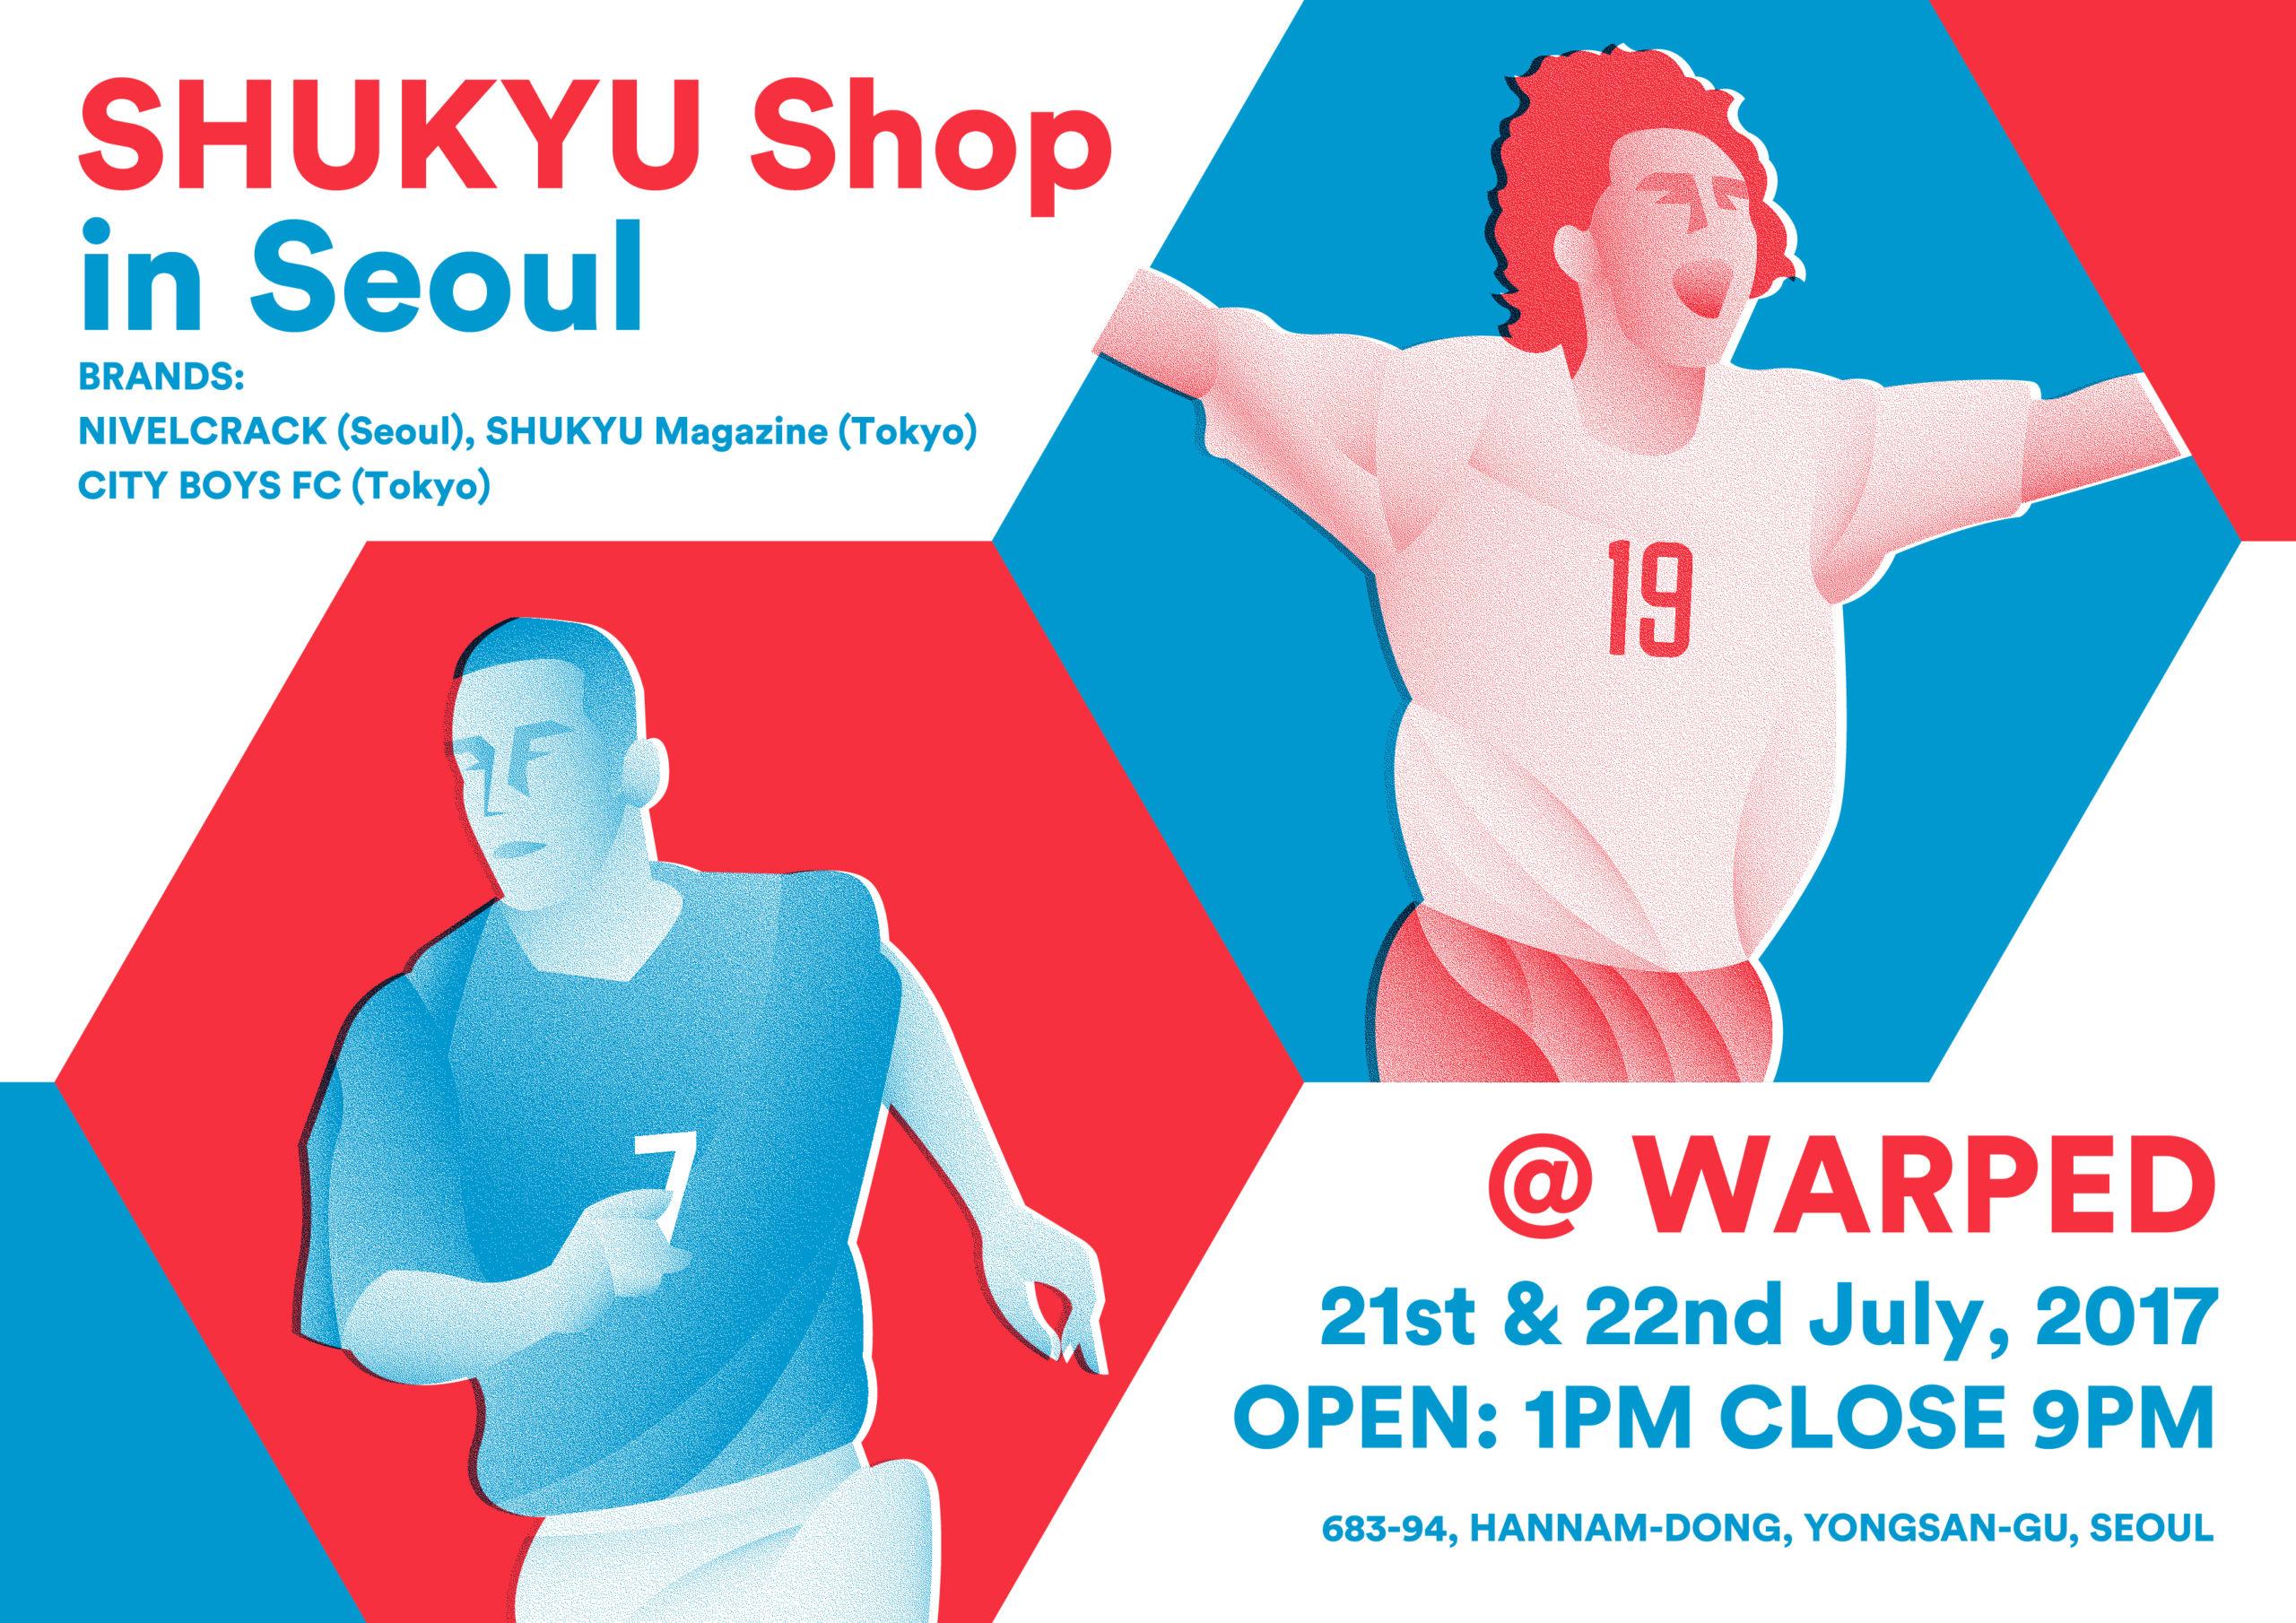 SHUKYU Shop in Seoul